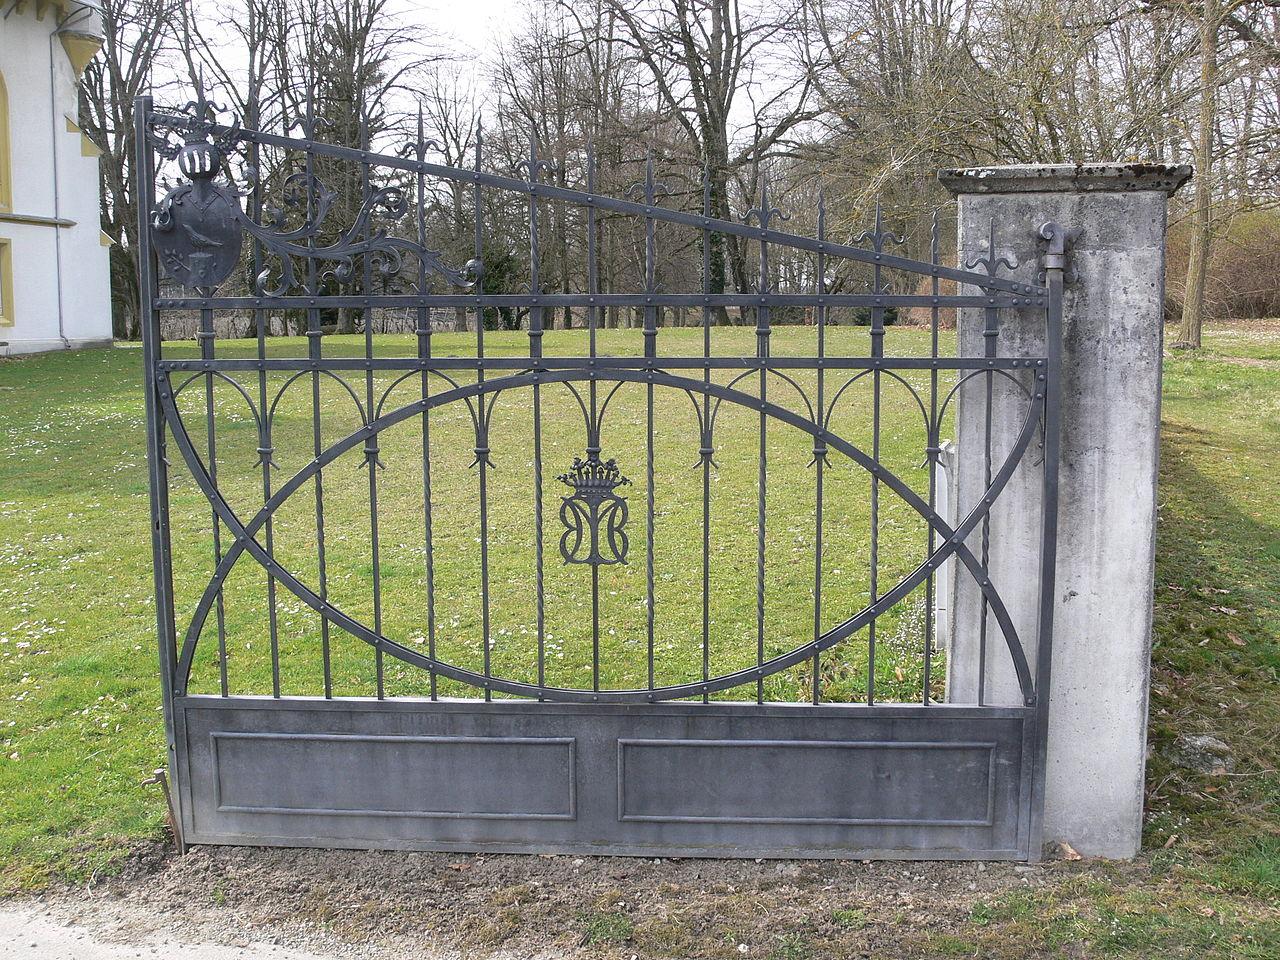 file:schloss benzenhofen gartentor - wikimedia commons